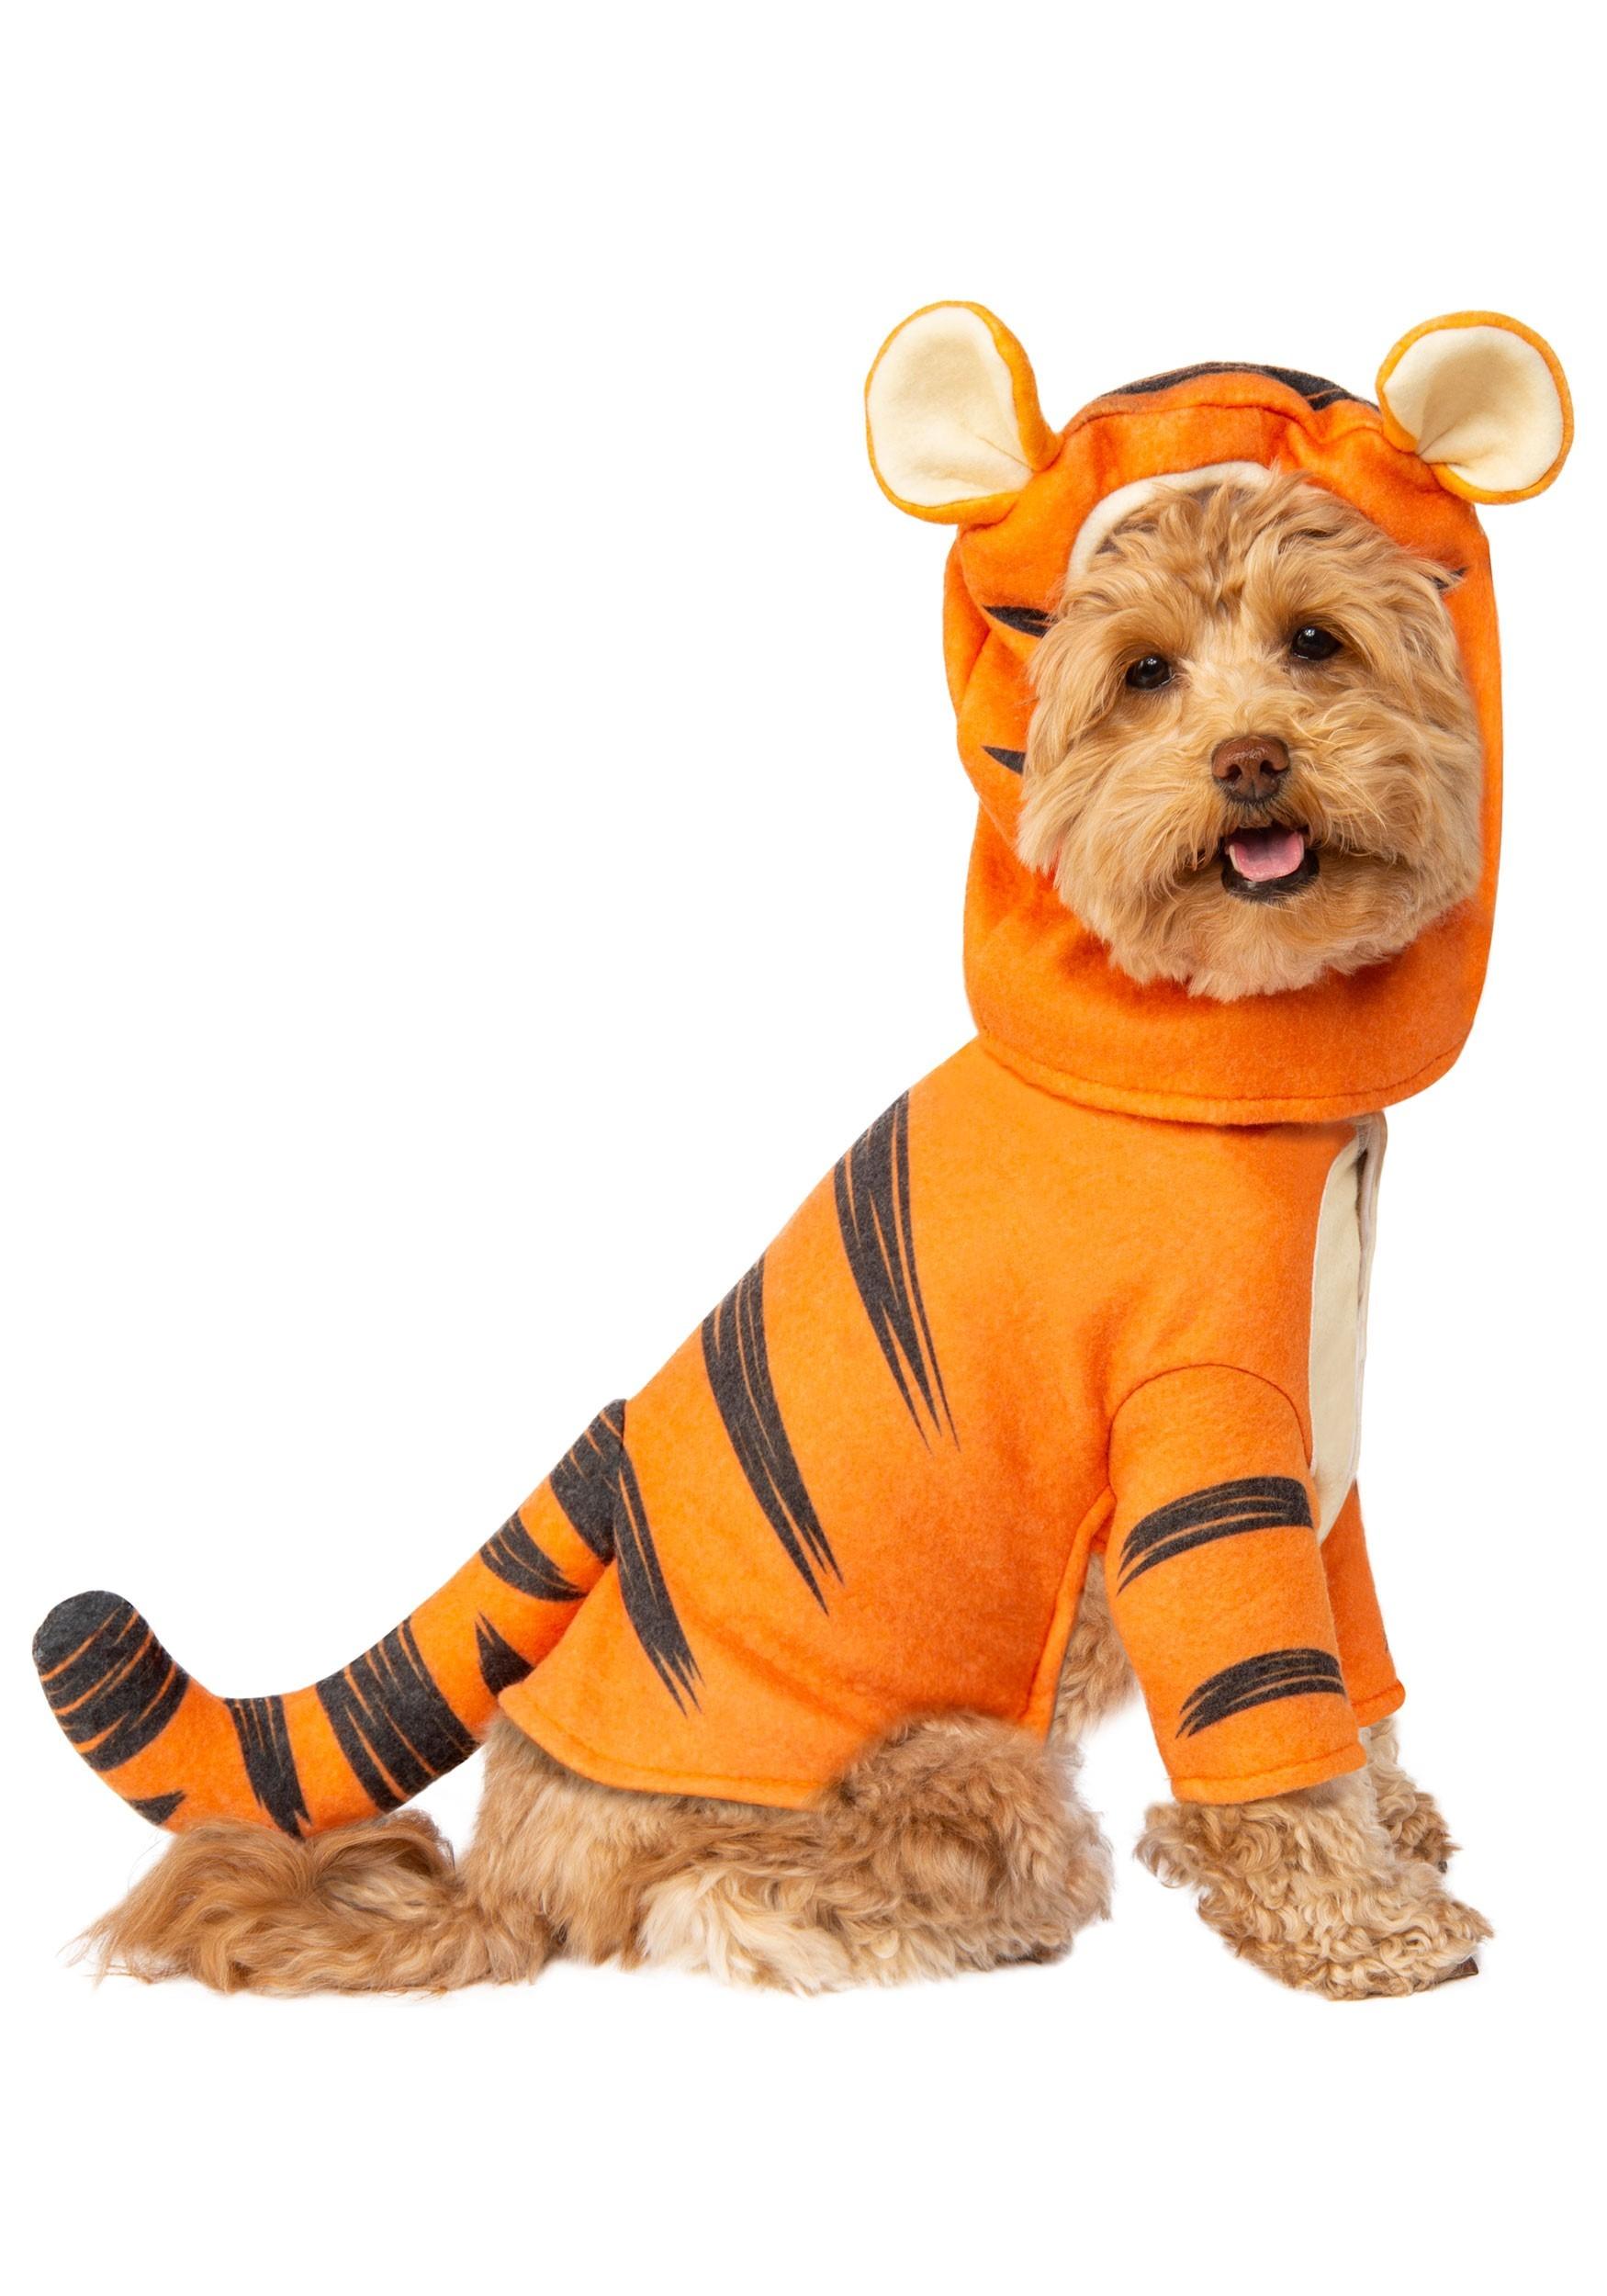 Tigger Pet Winnie the Pooh Costume